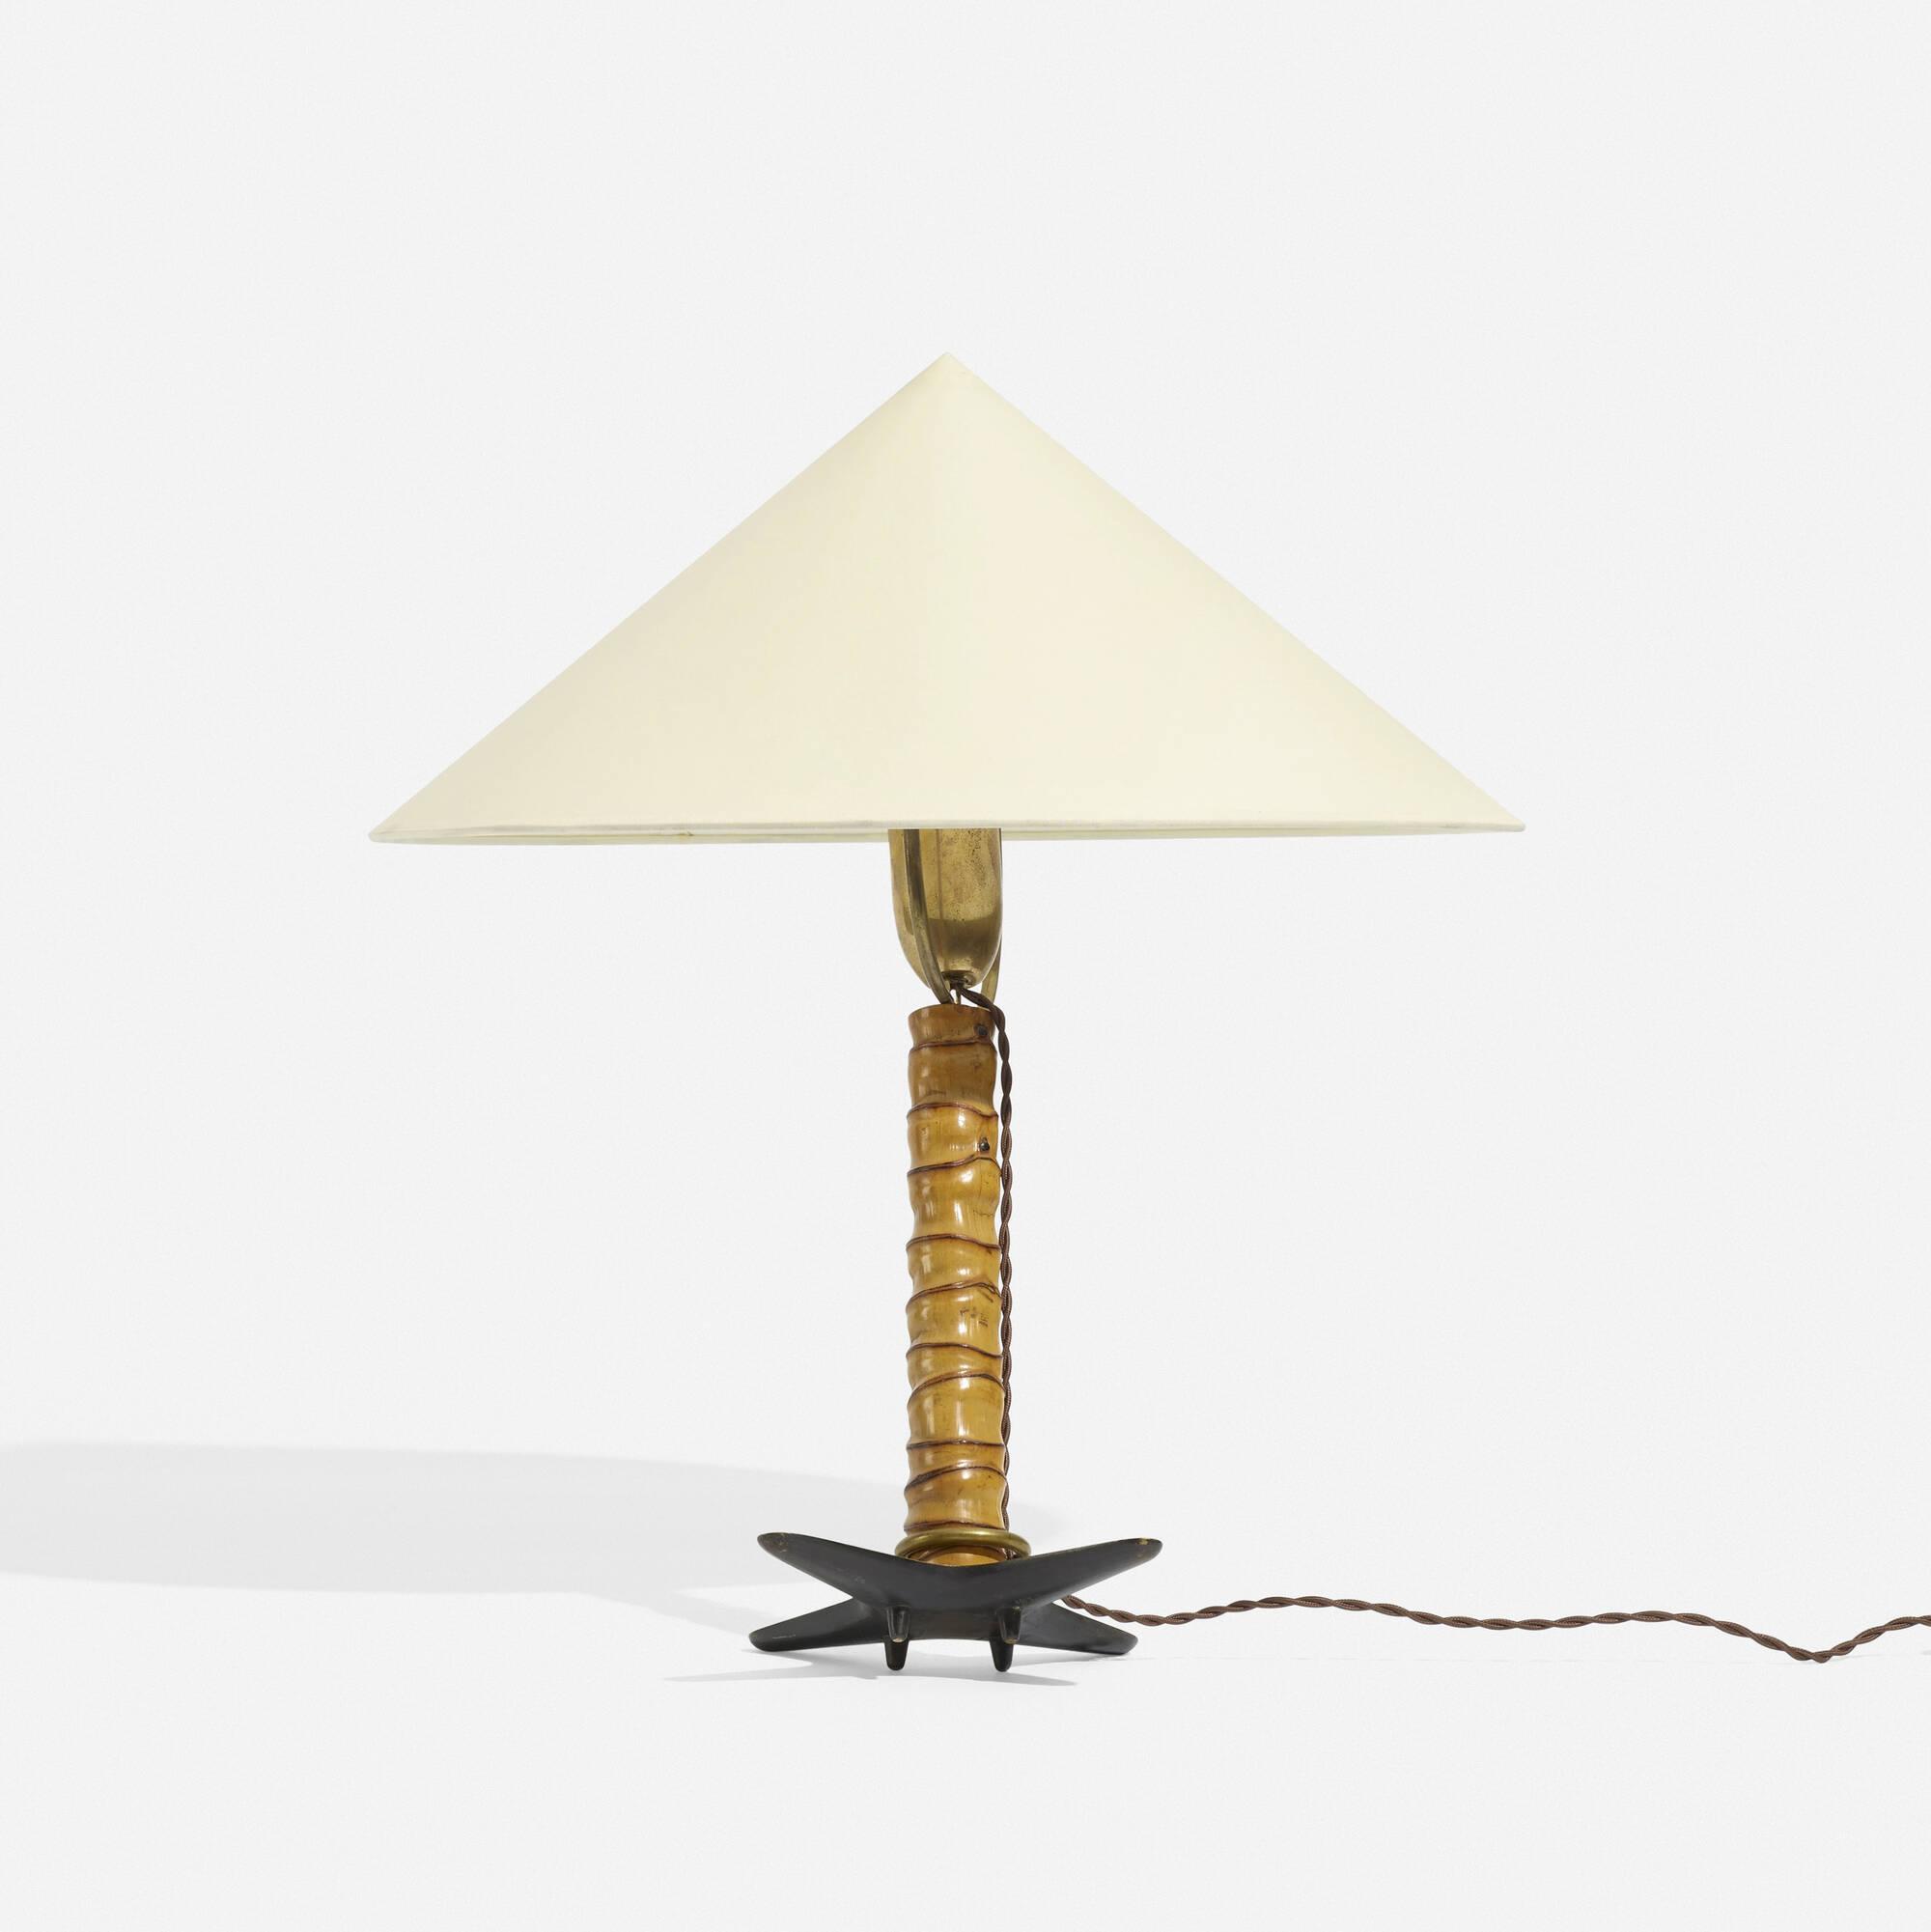 140: Carl Auböck II / table lamp (3 of 3)